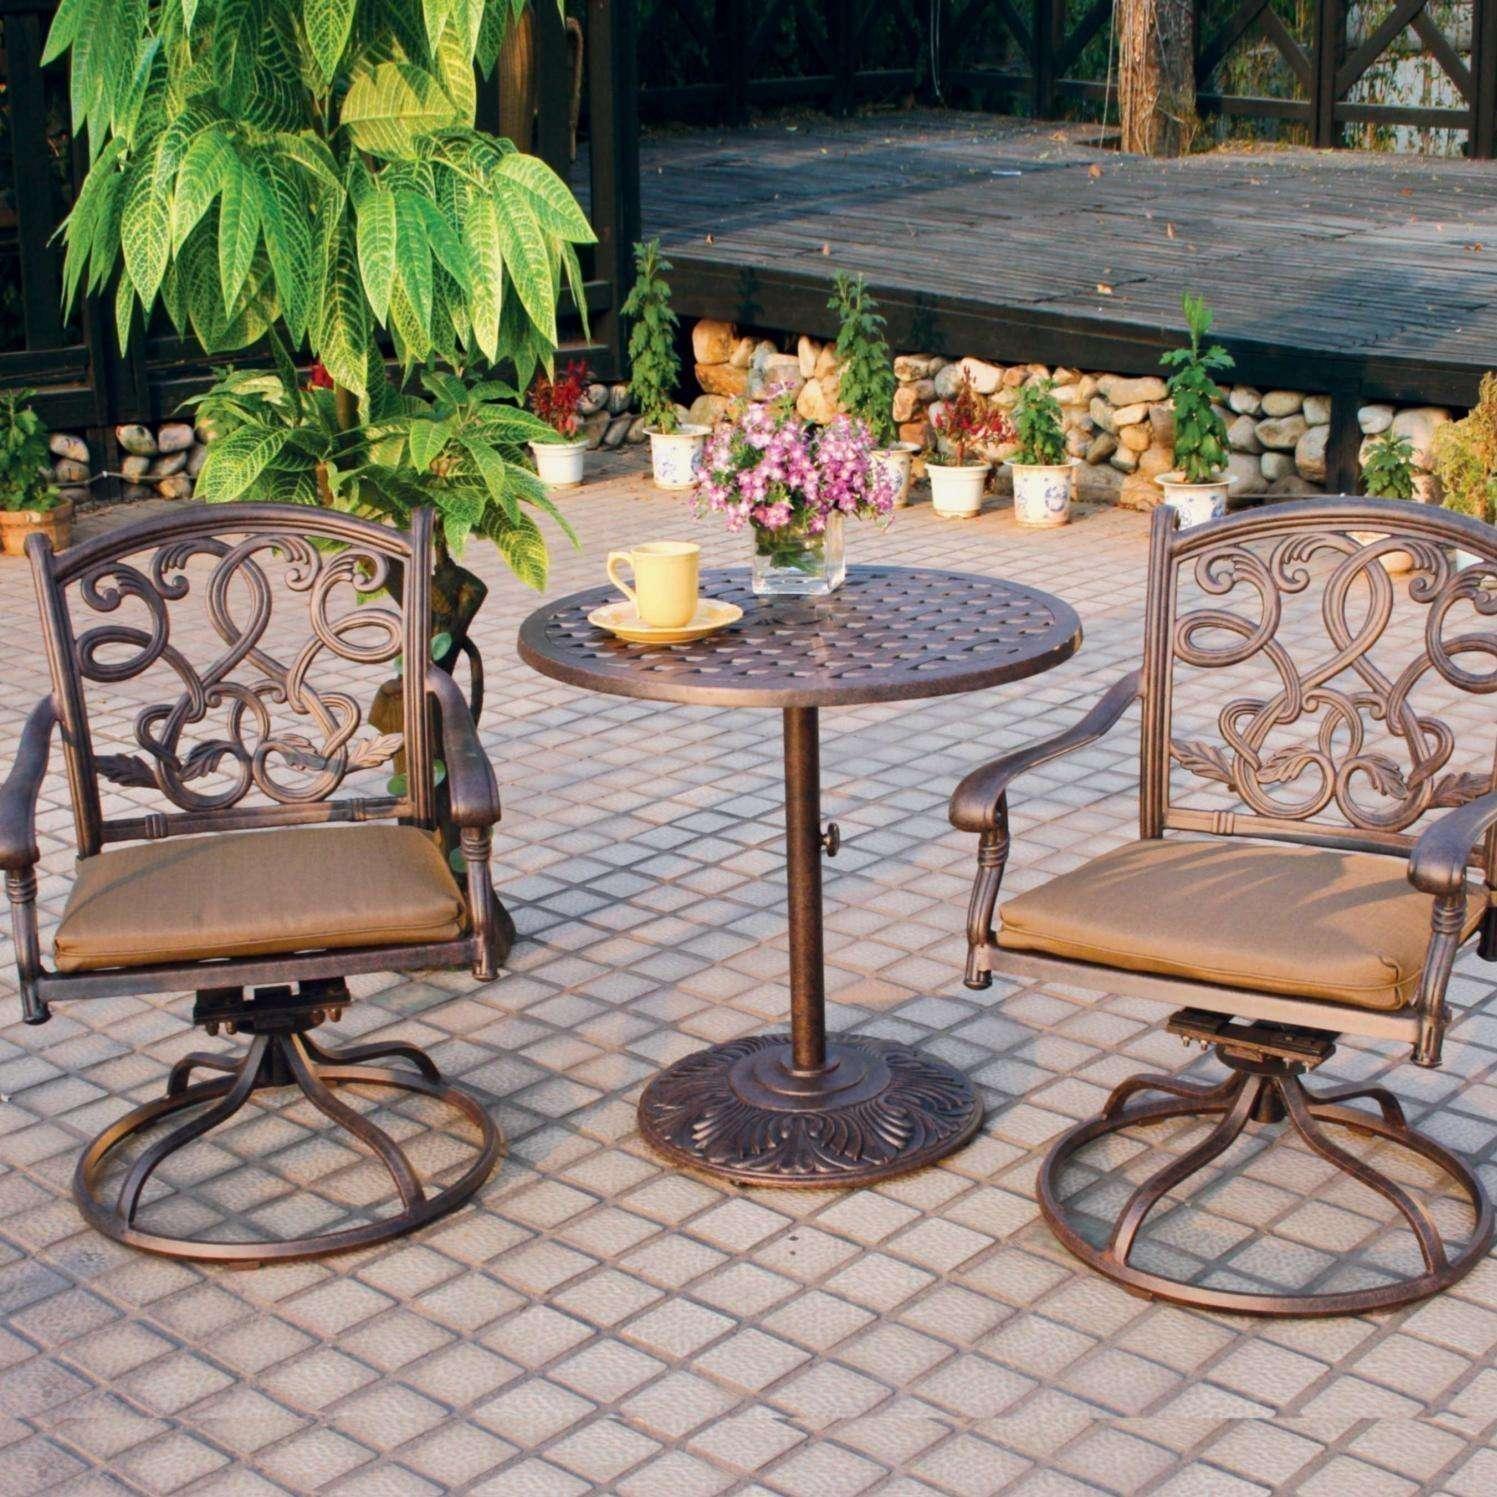 darlee santa monica 3 piece cast aluminum patio bistro set with swivel rockers